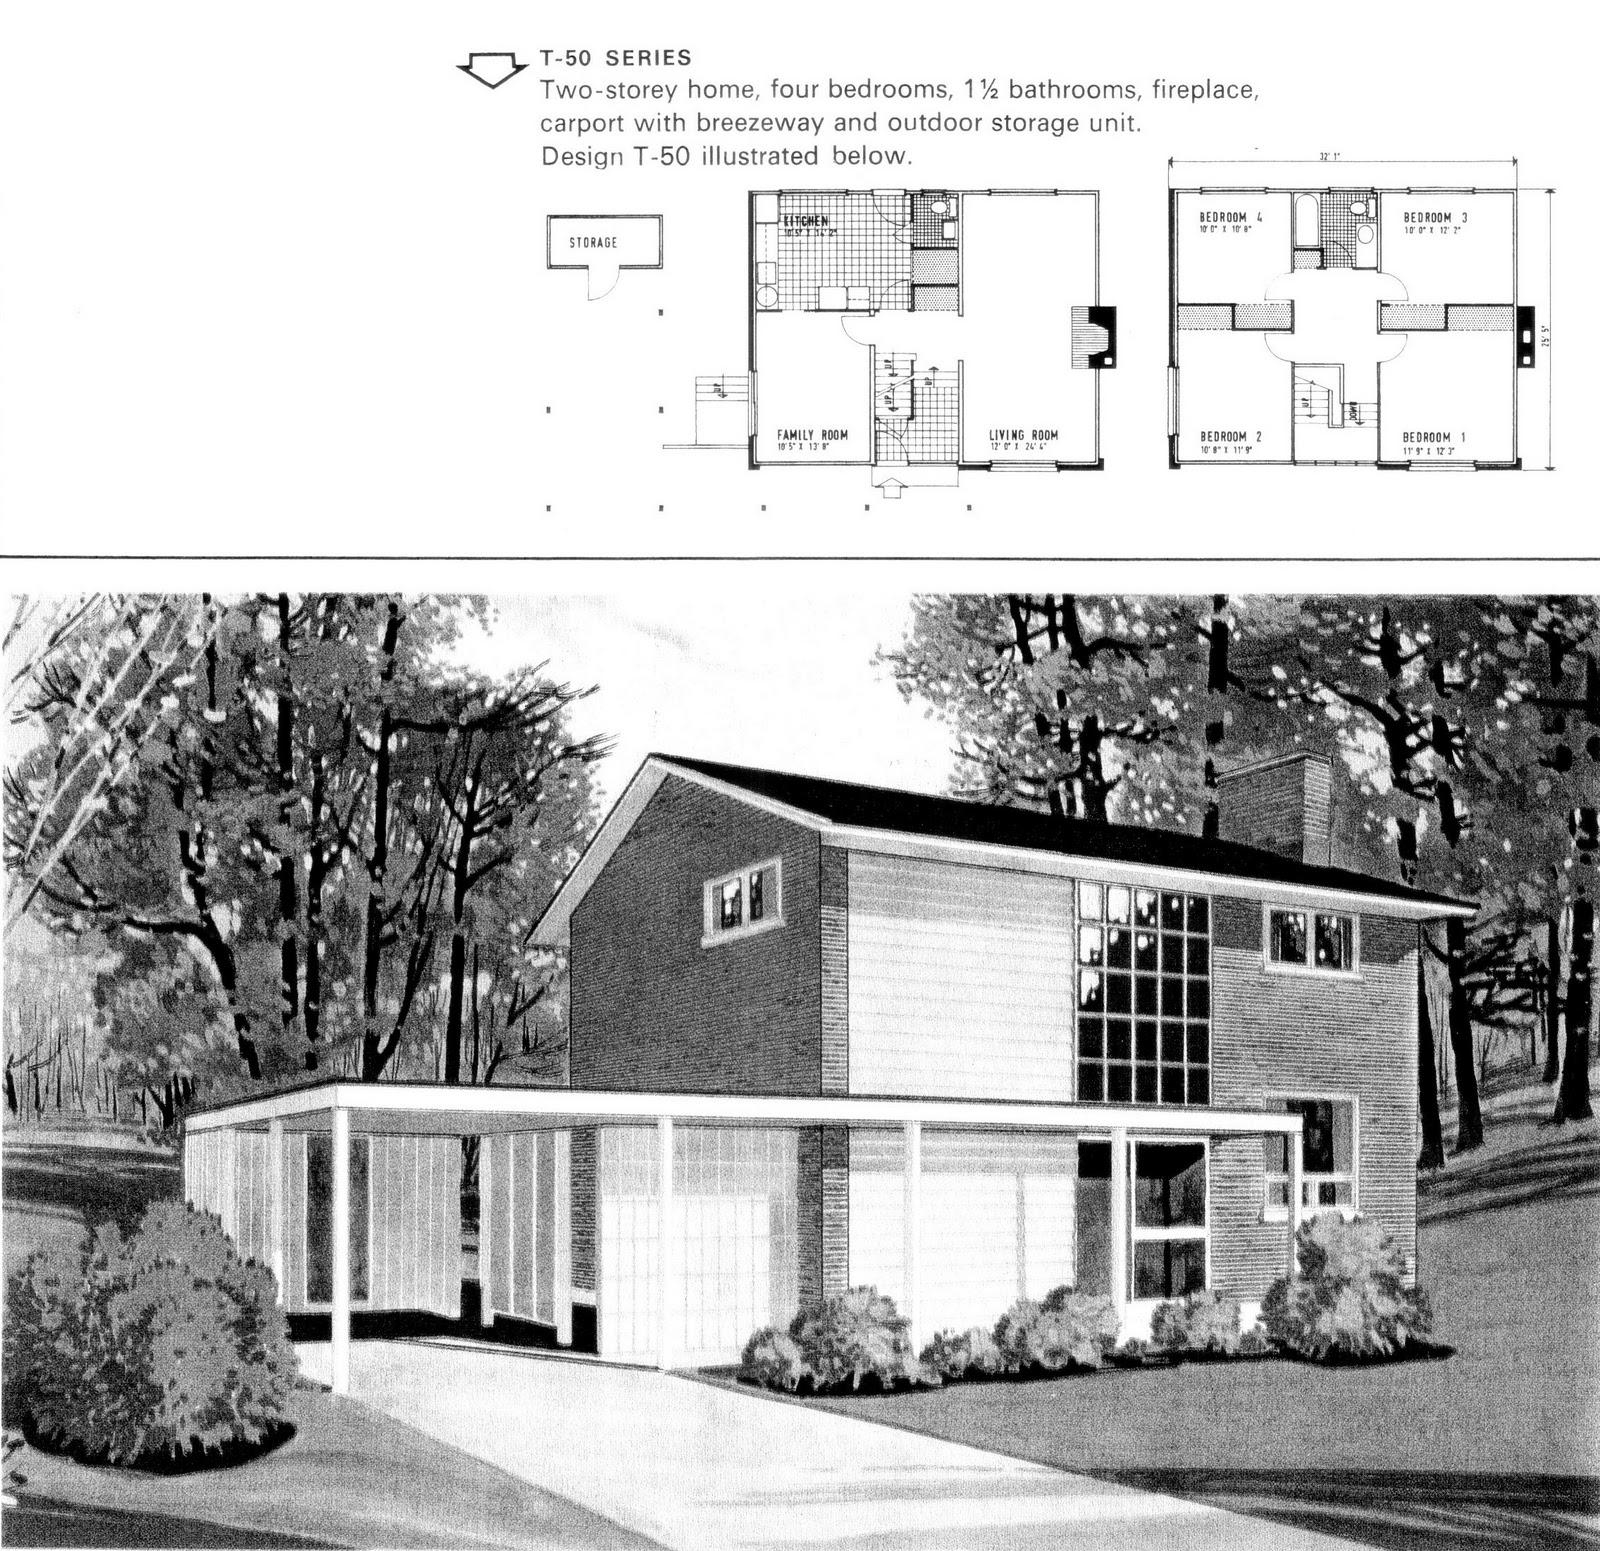 1970s Modern Home Architecture: Mid-Century Modern And 1970s-Era Ottawa